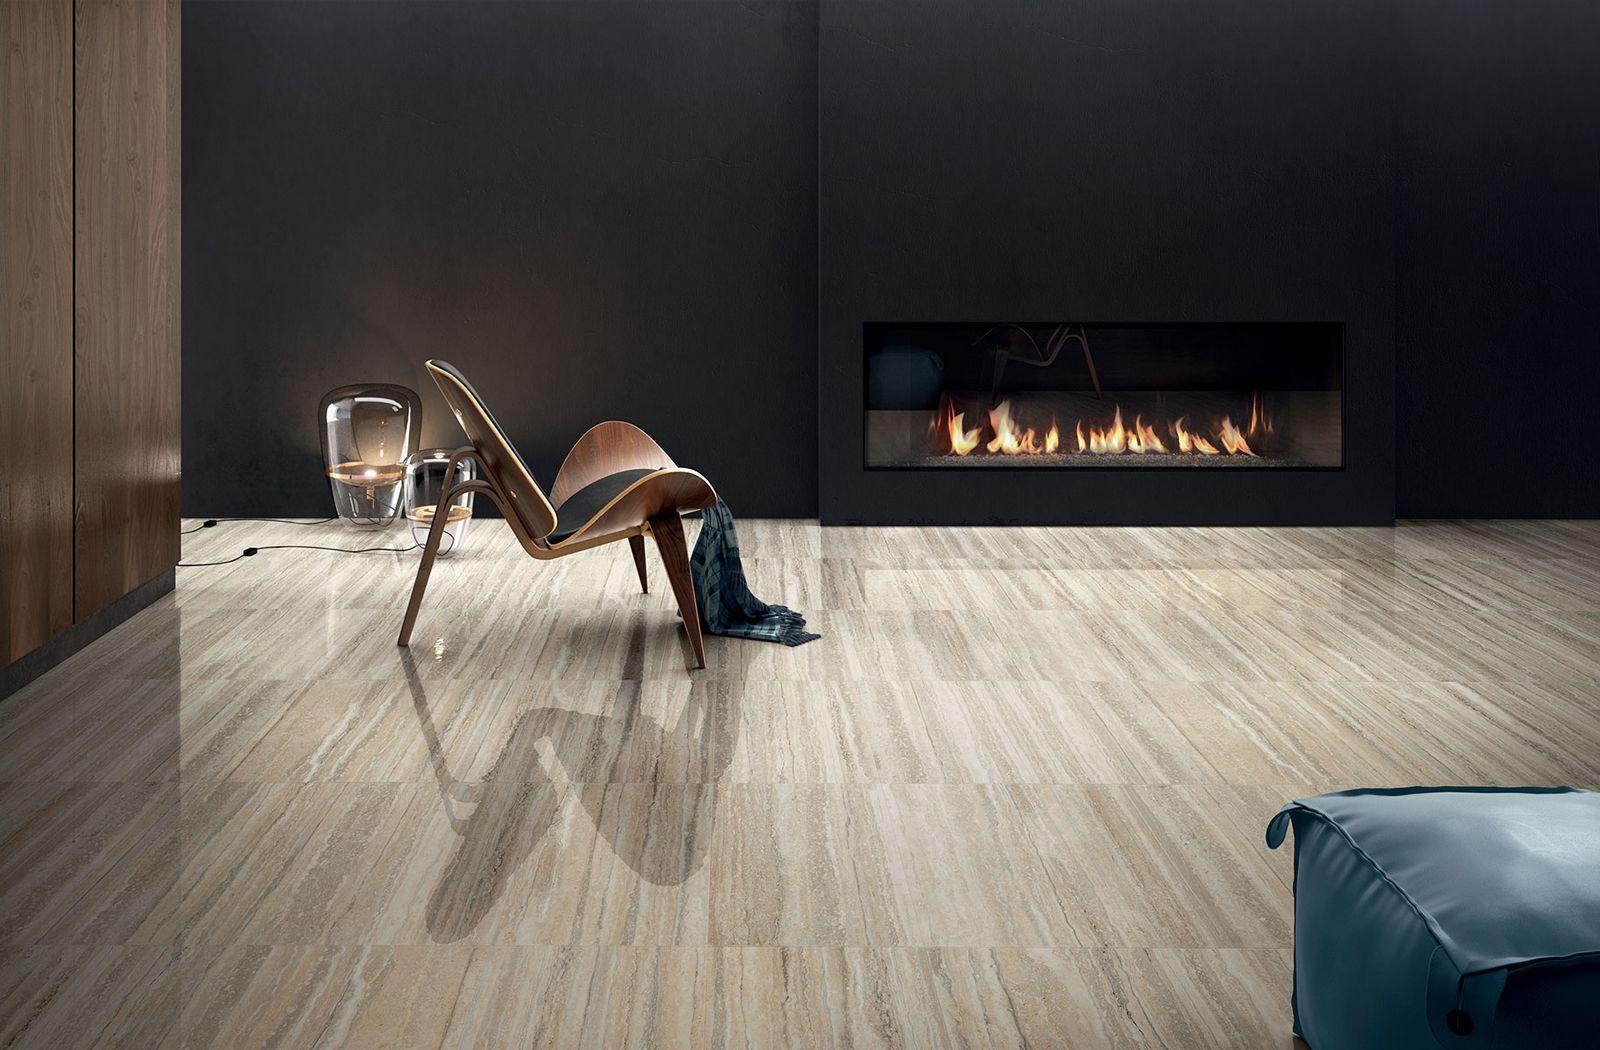 Floor Tile Decor Fascinating Modern Luxurious Living Room Decor With Tipos Floor Tile Design Ideas